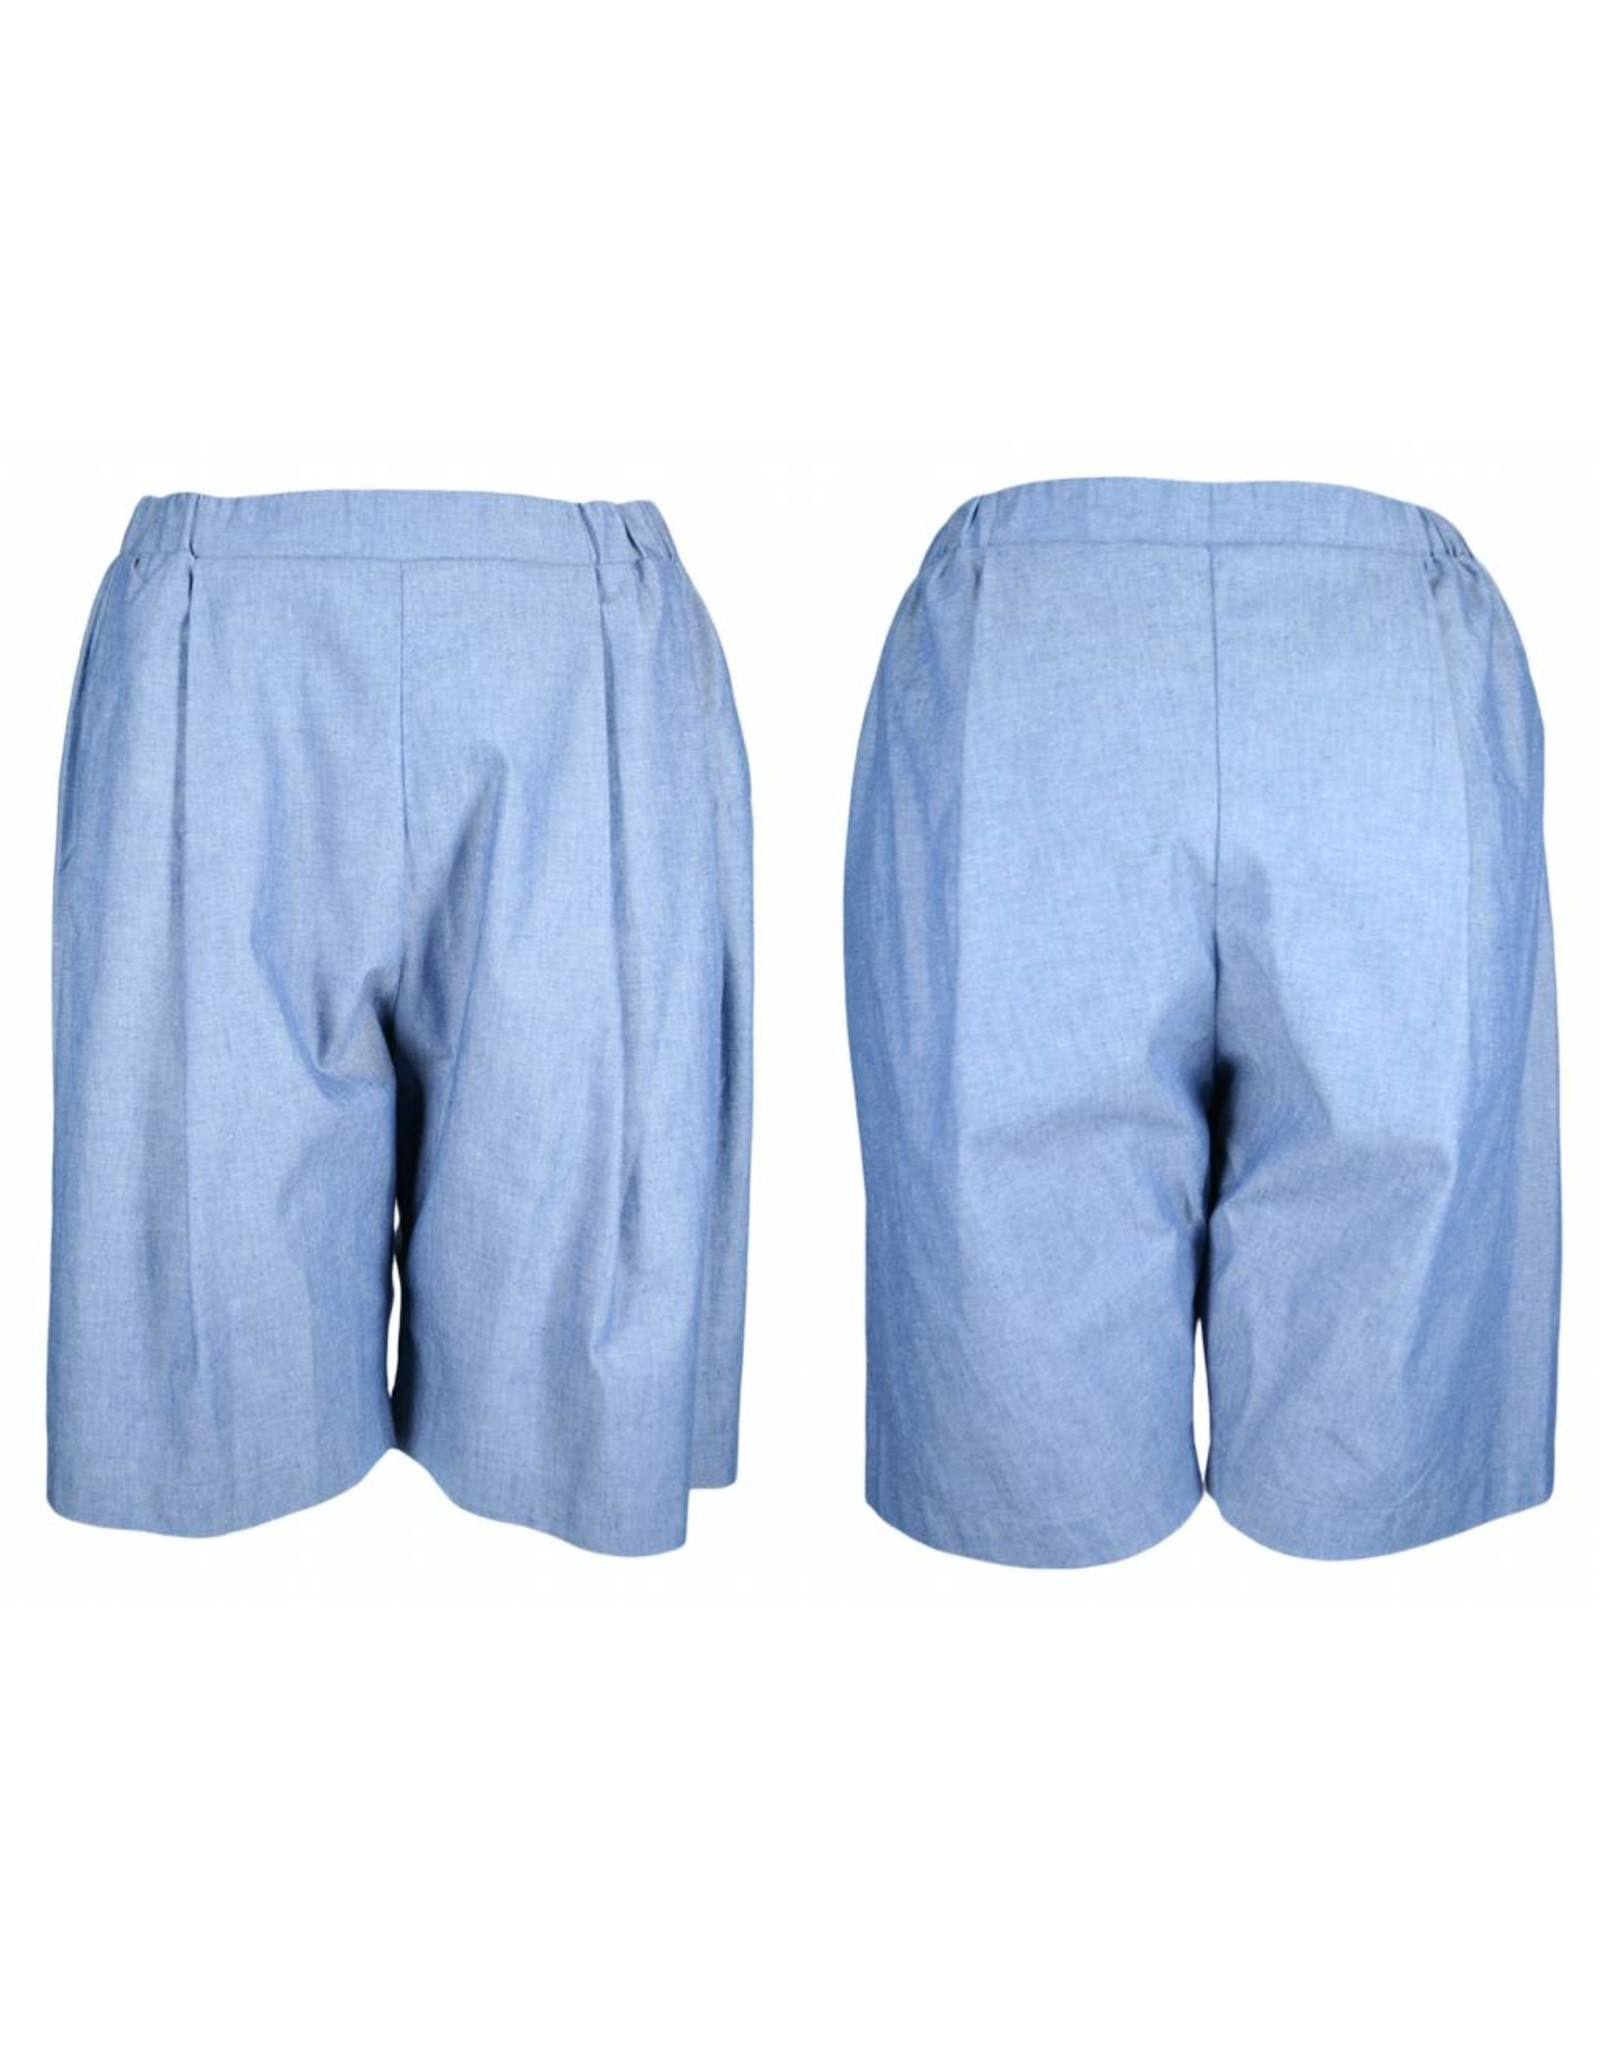 format COSY II shorts, light denim